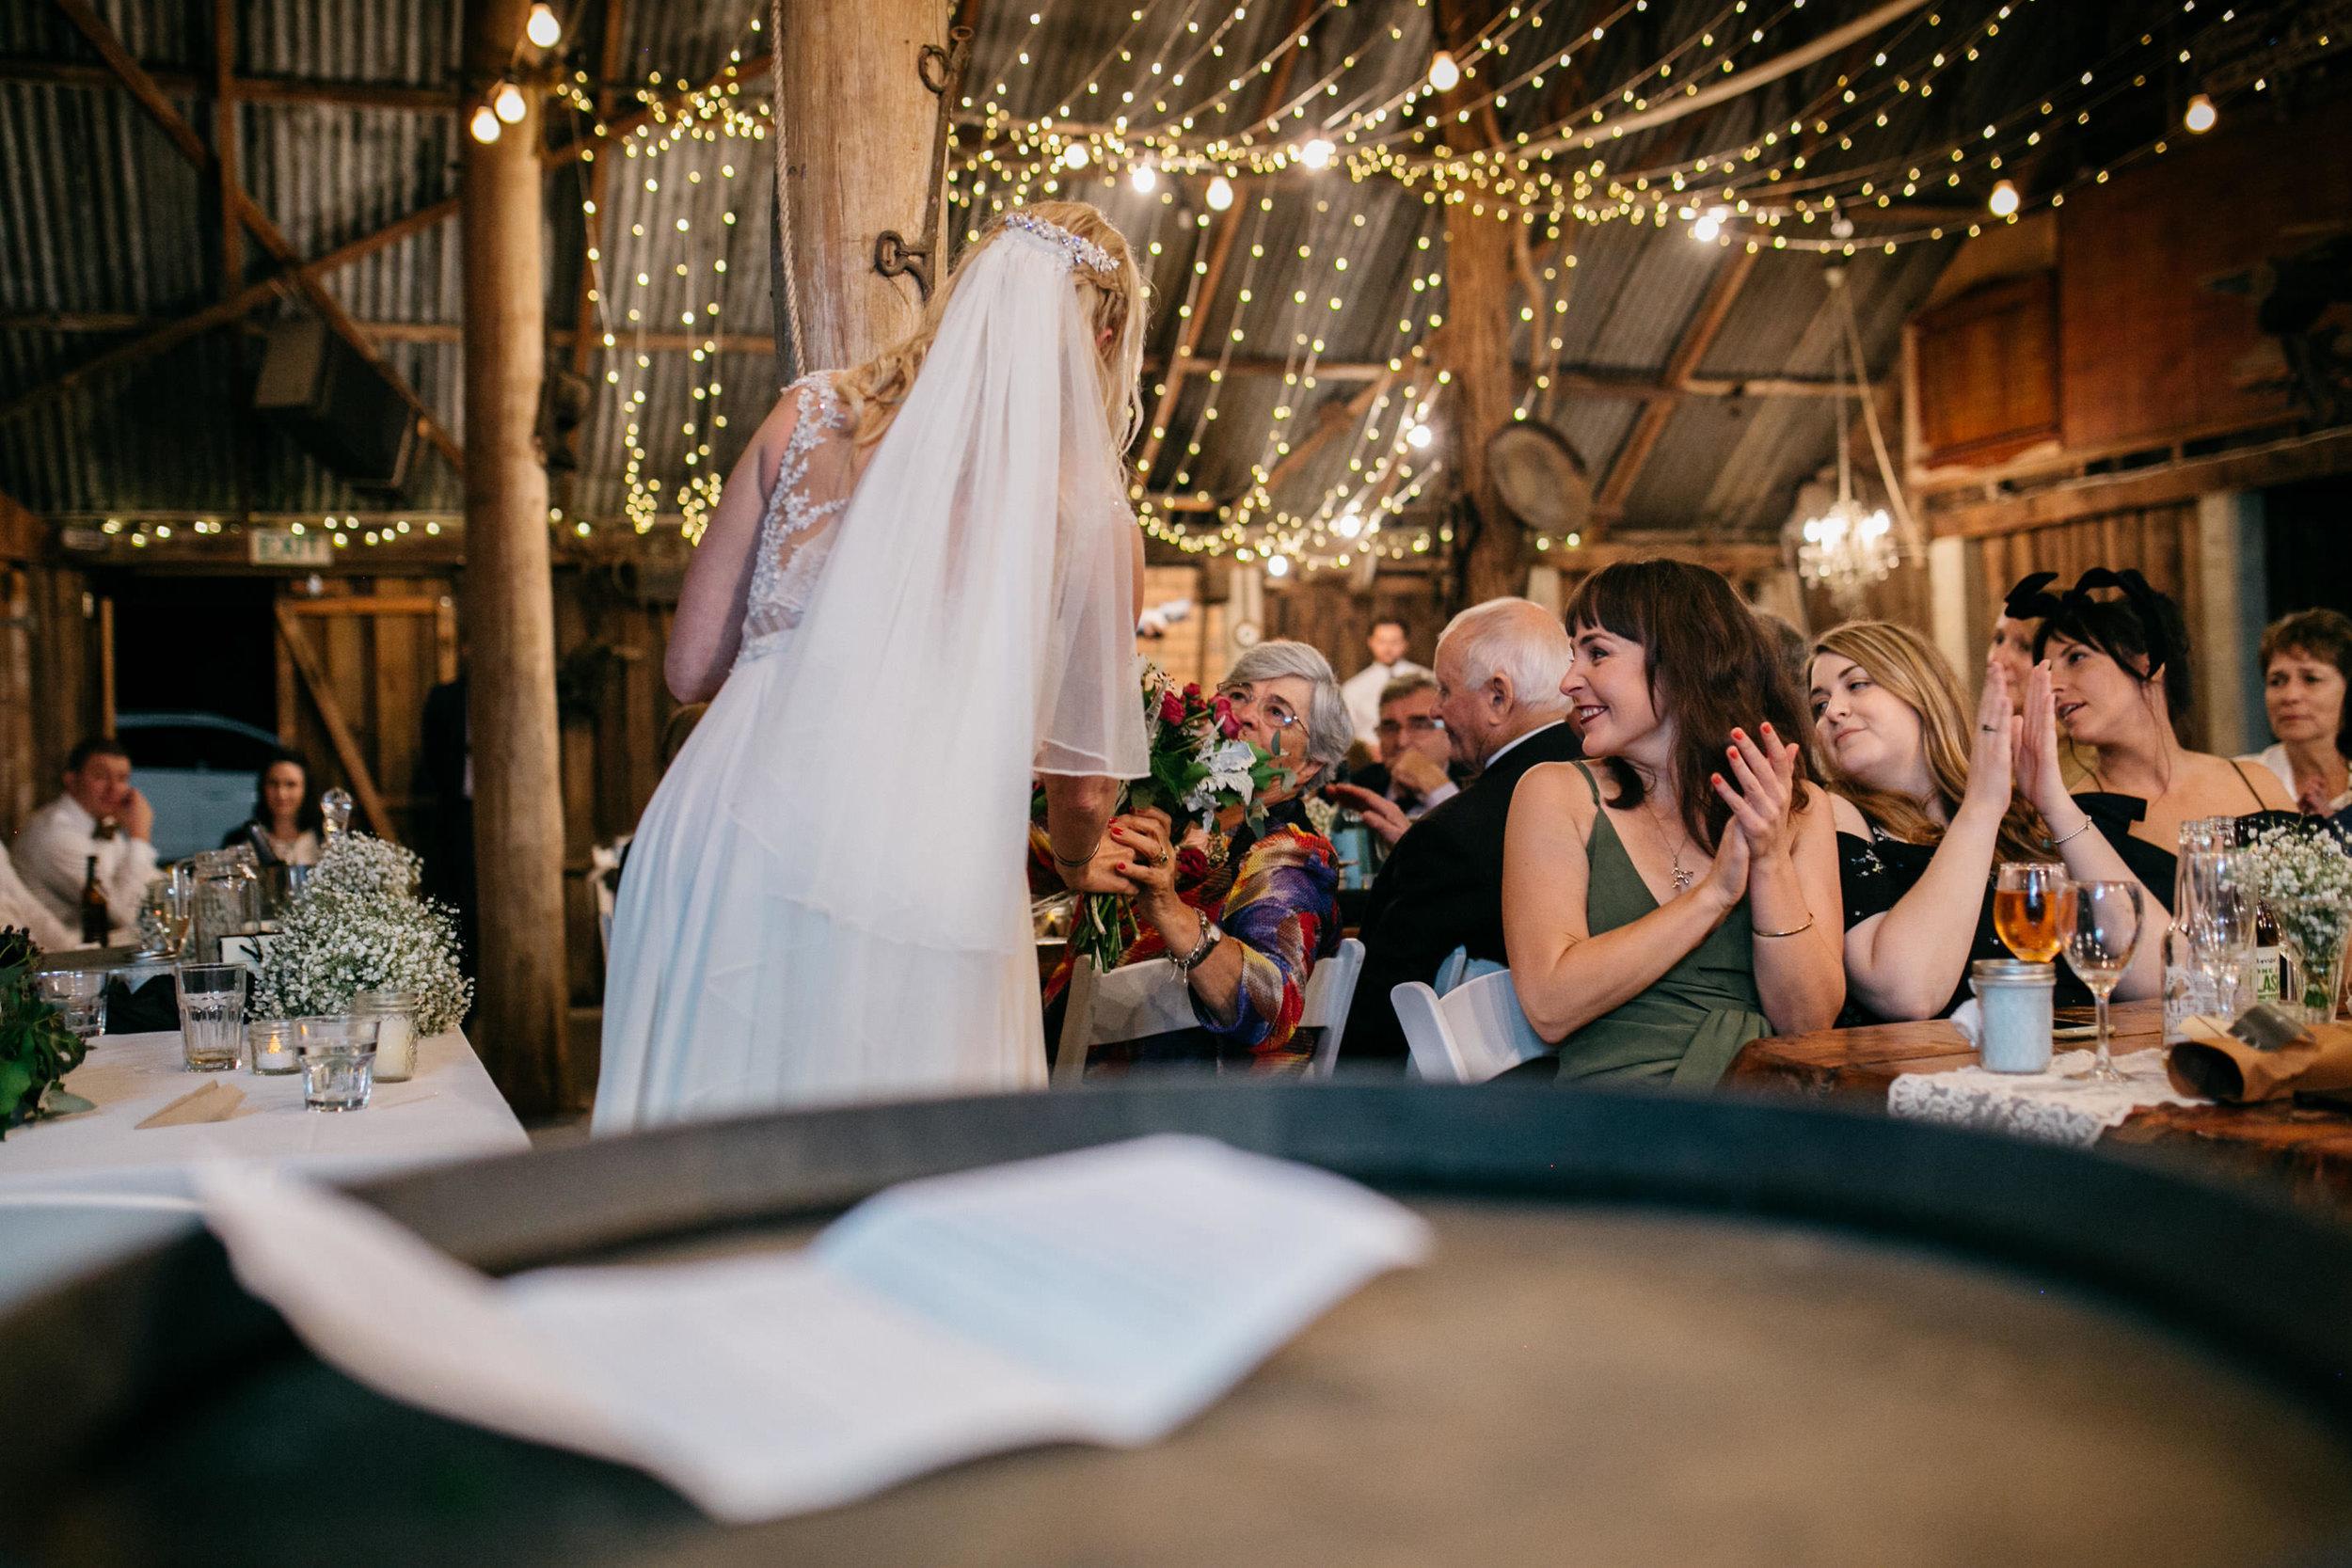 True North Photography_Boomerang Farm_Stacey and Isaac_Gold Coast Wedding_Barm Wedding_Hinterland Wedding-209.jpg